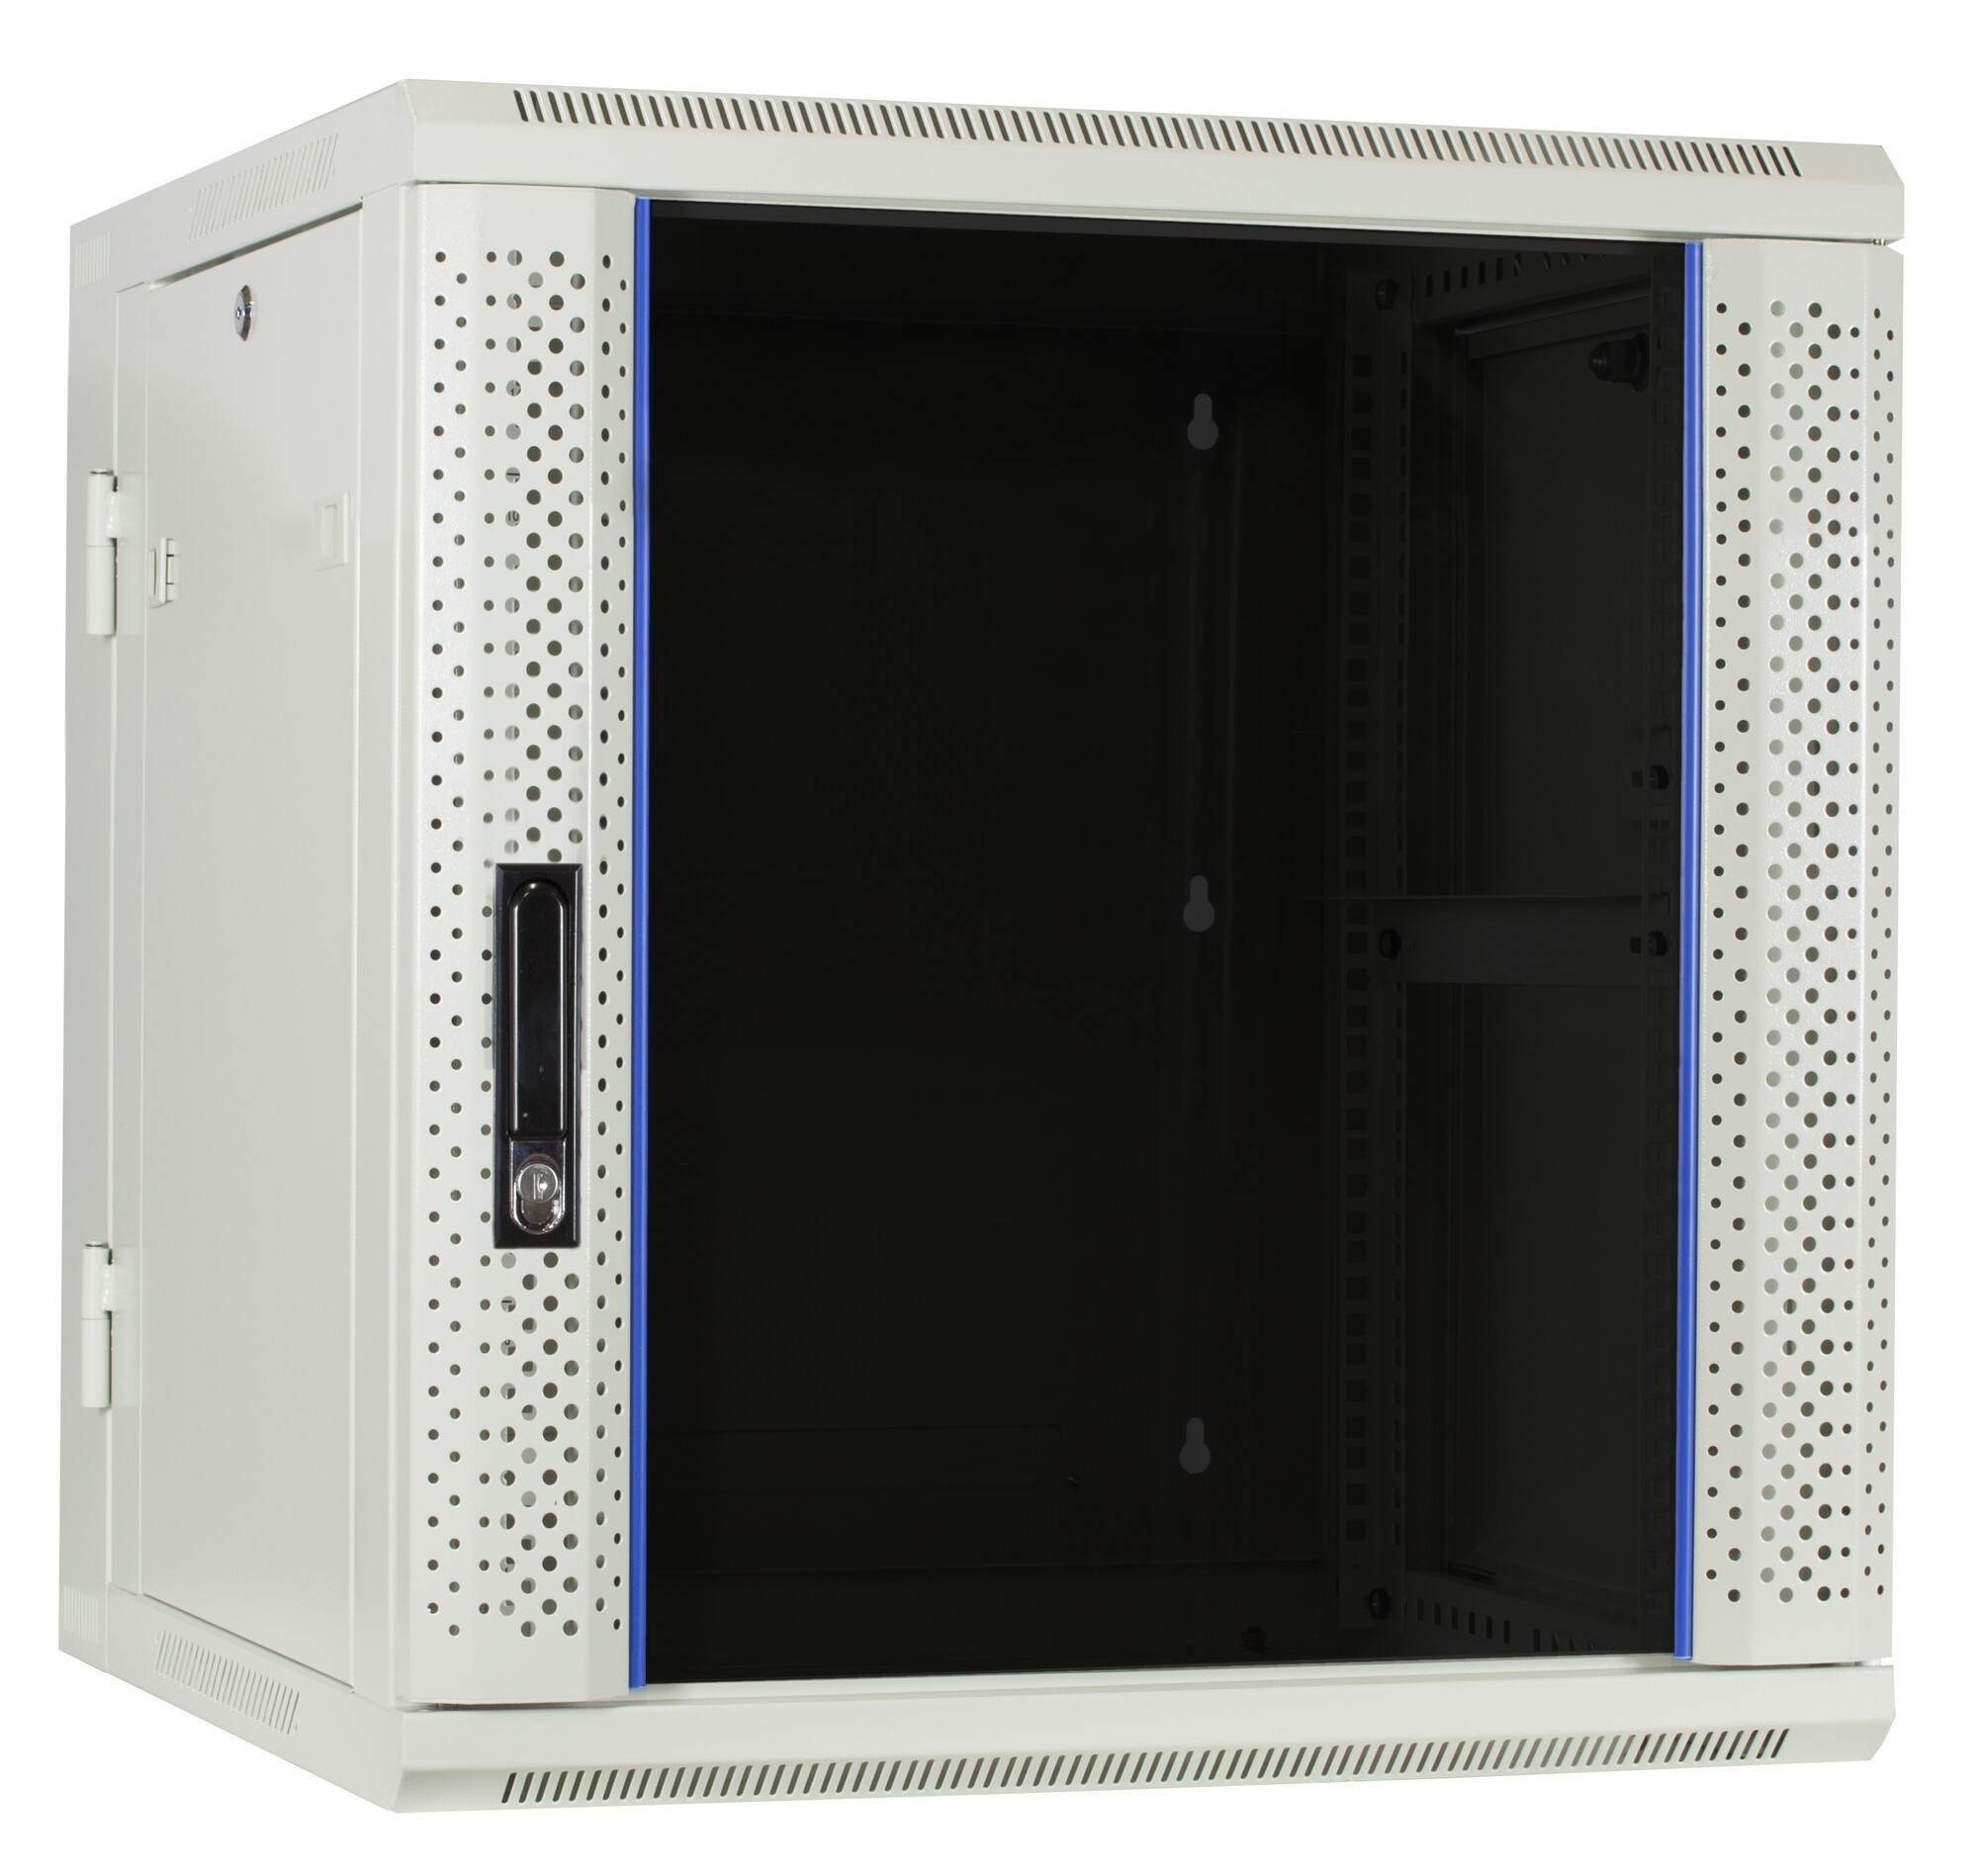 Afbeelding van 12U witte wandkast (kantelbaar) met glazen deur 600x600x635mm